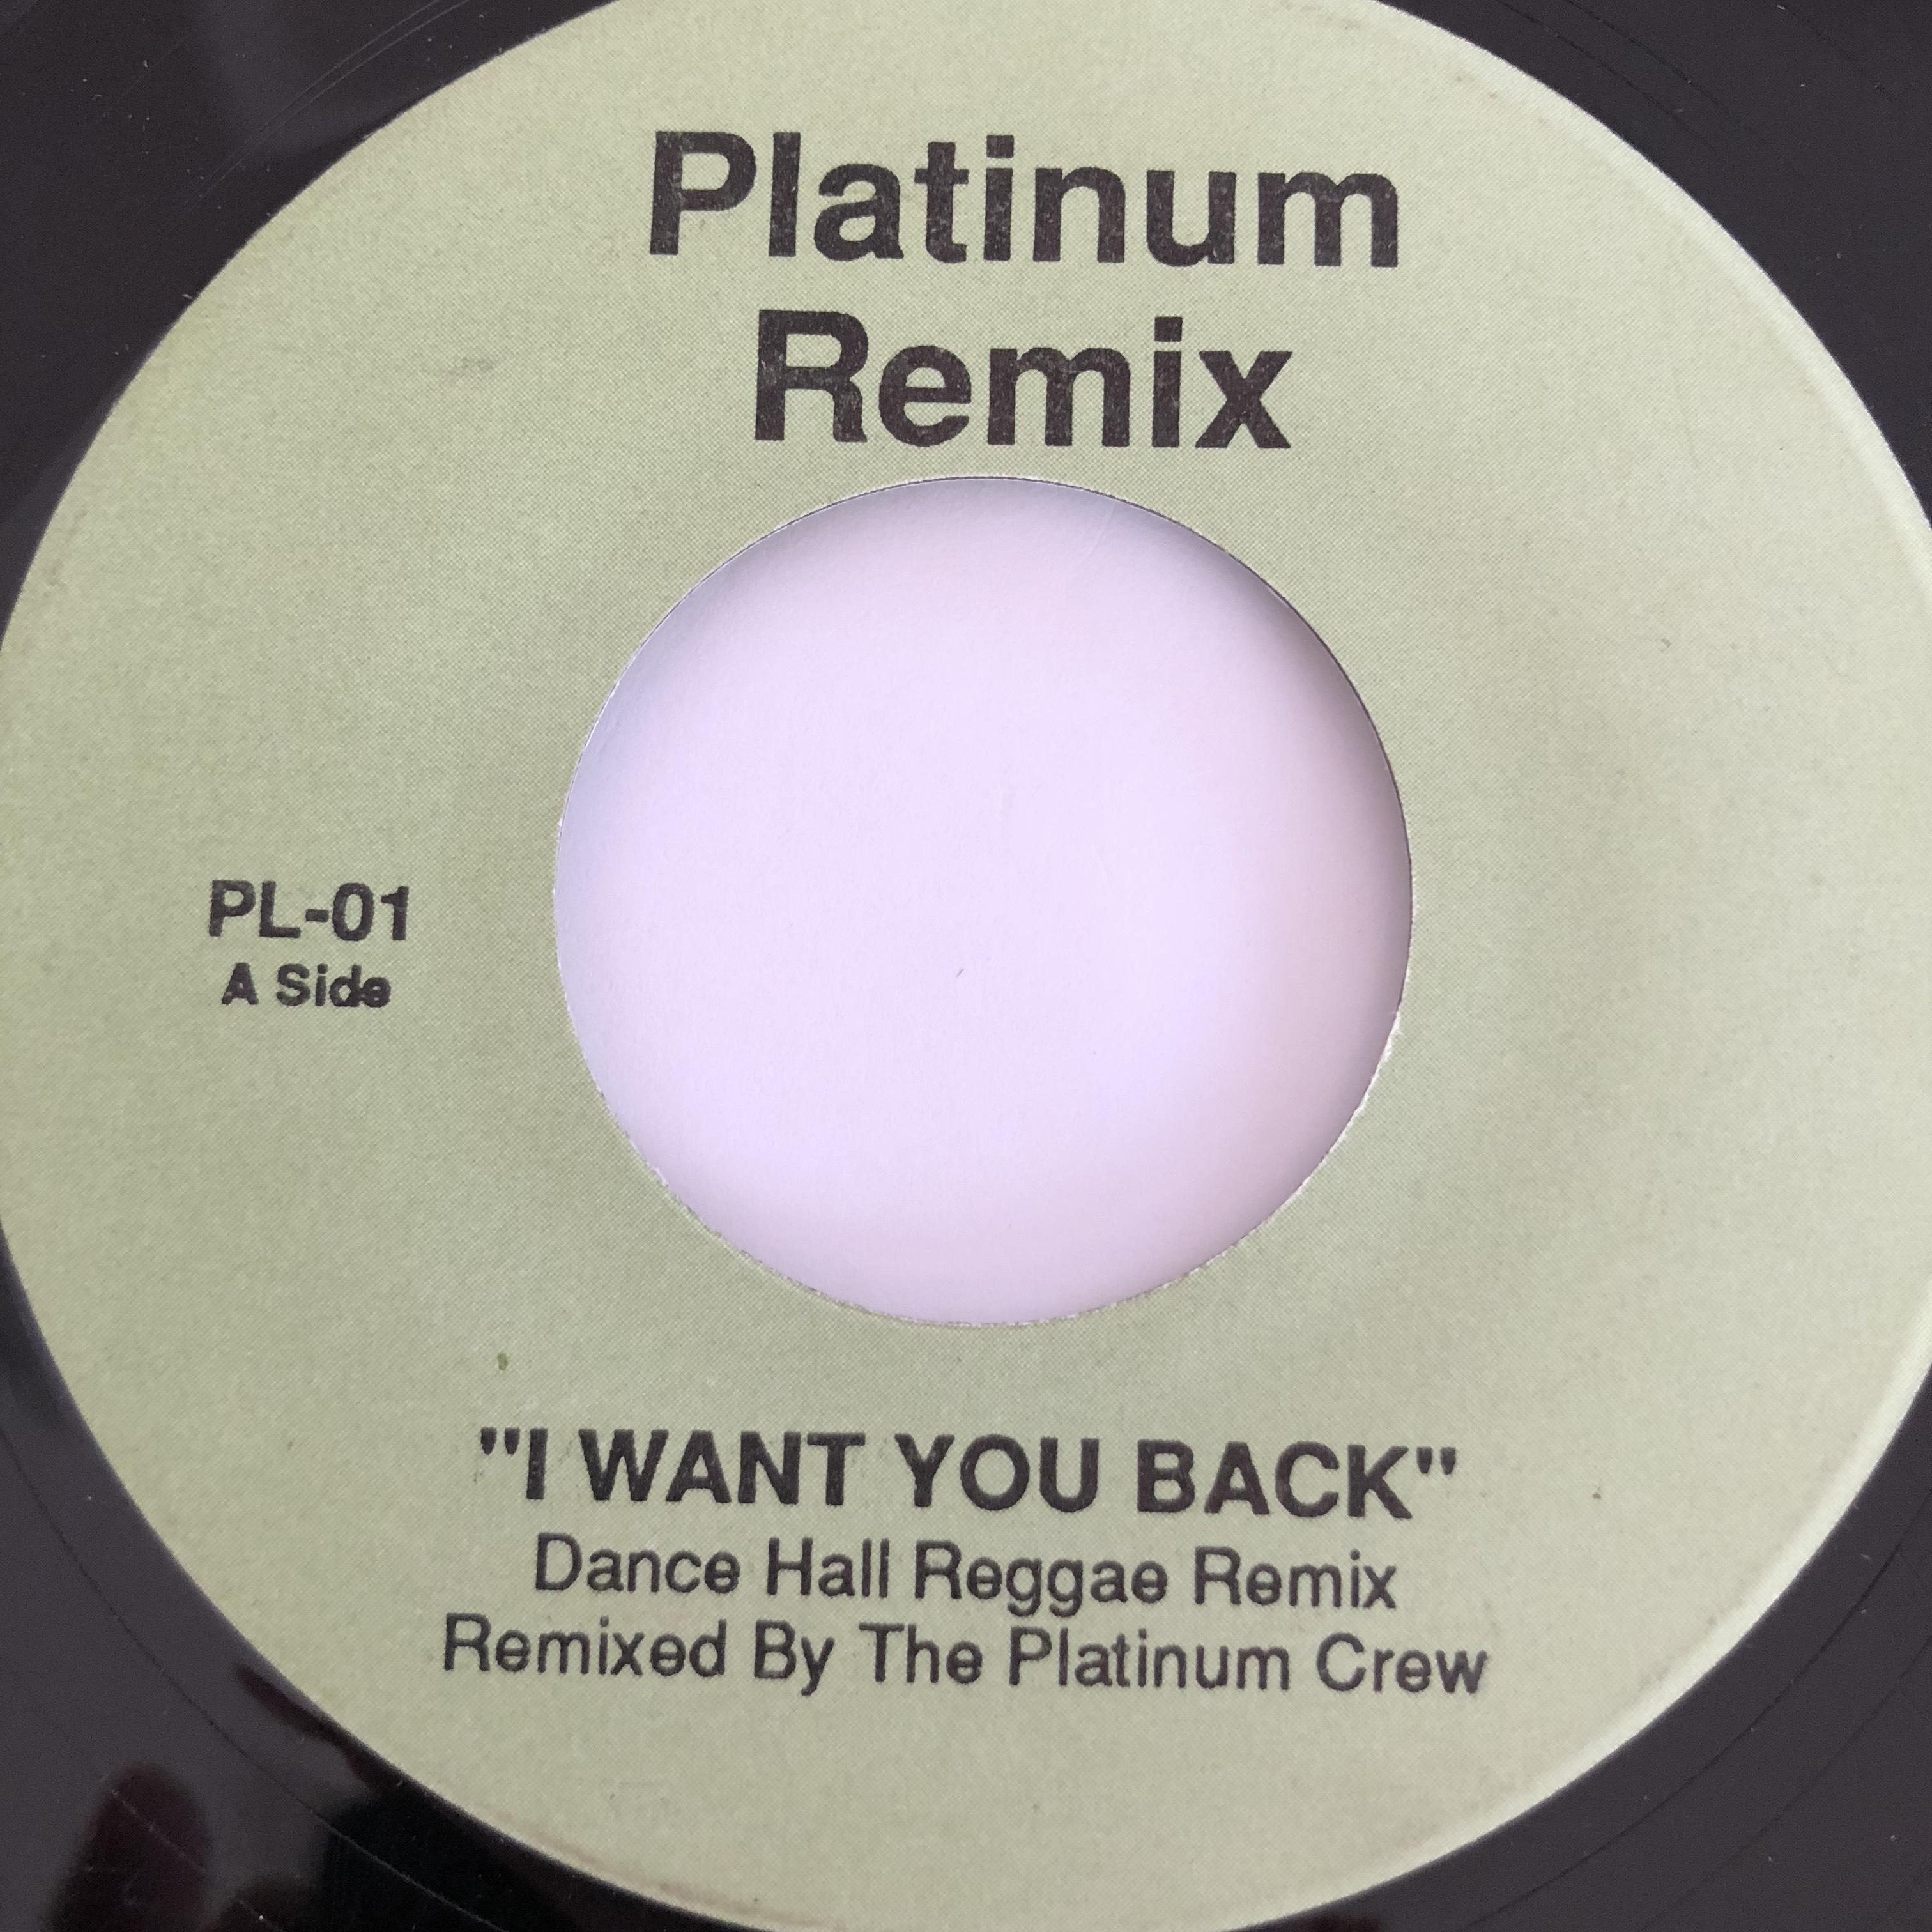 Jackson 5(ジャクソン5) - I Want You Back (Remix)【7'】